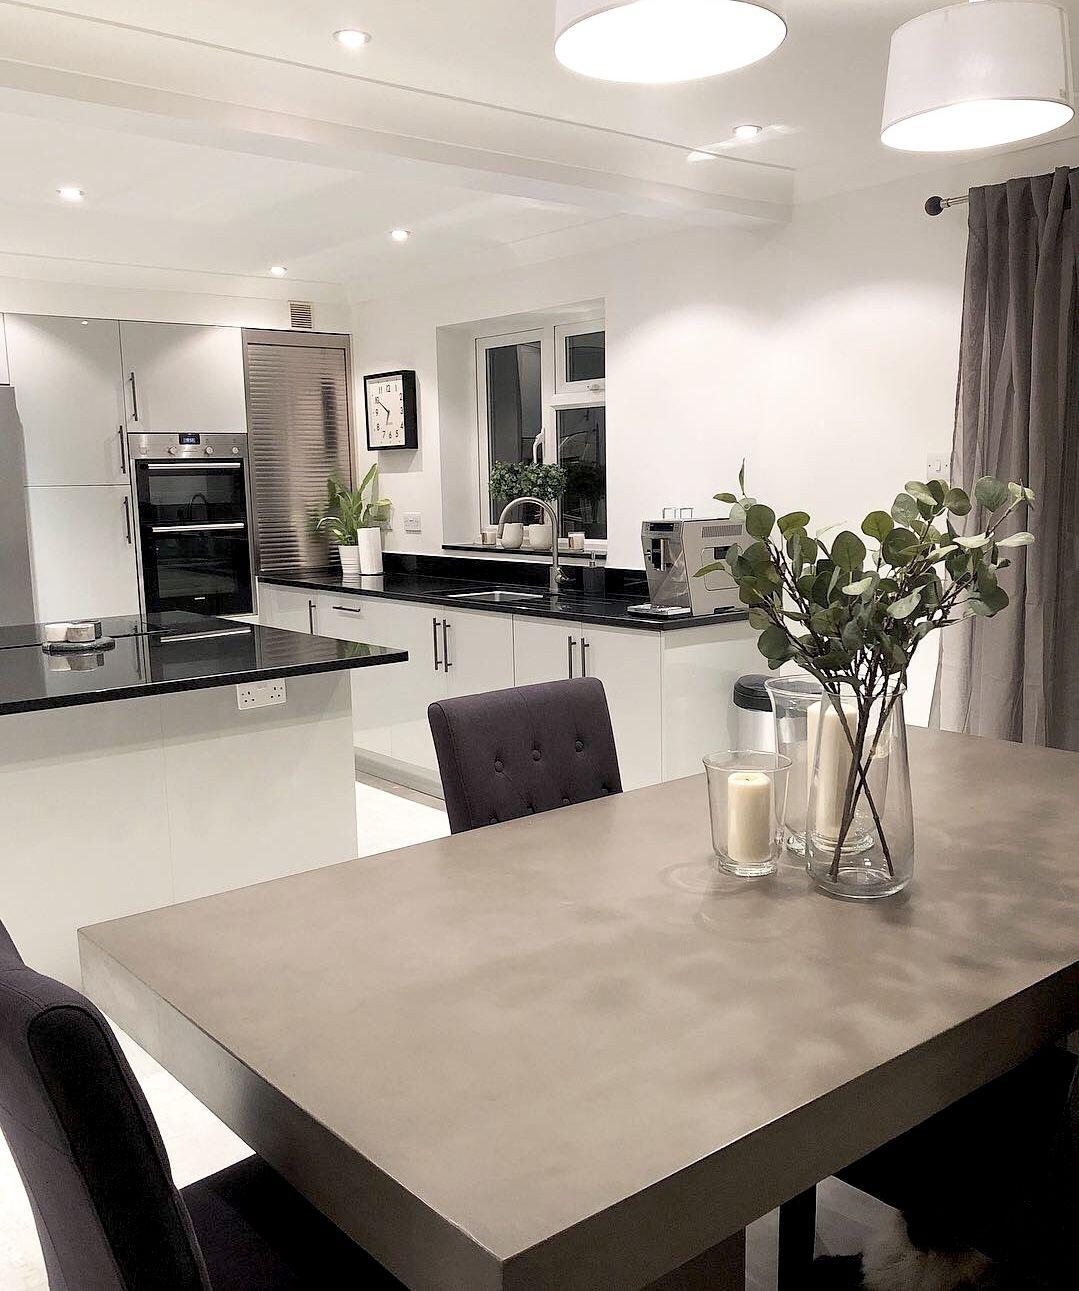 Kitchen And Dining Room Makeover Interior Design Blog Cloud